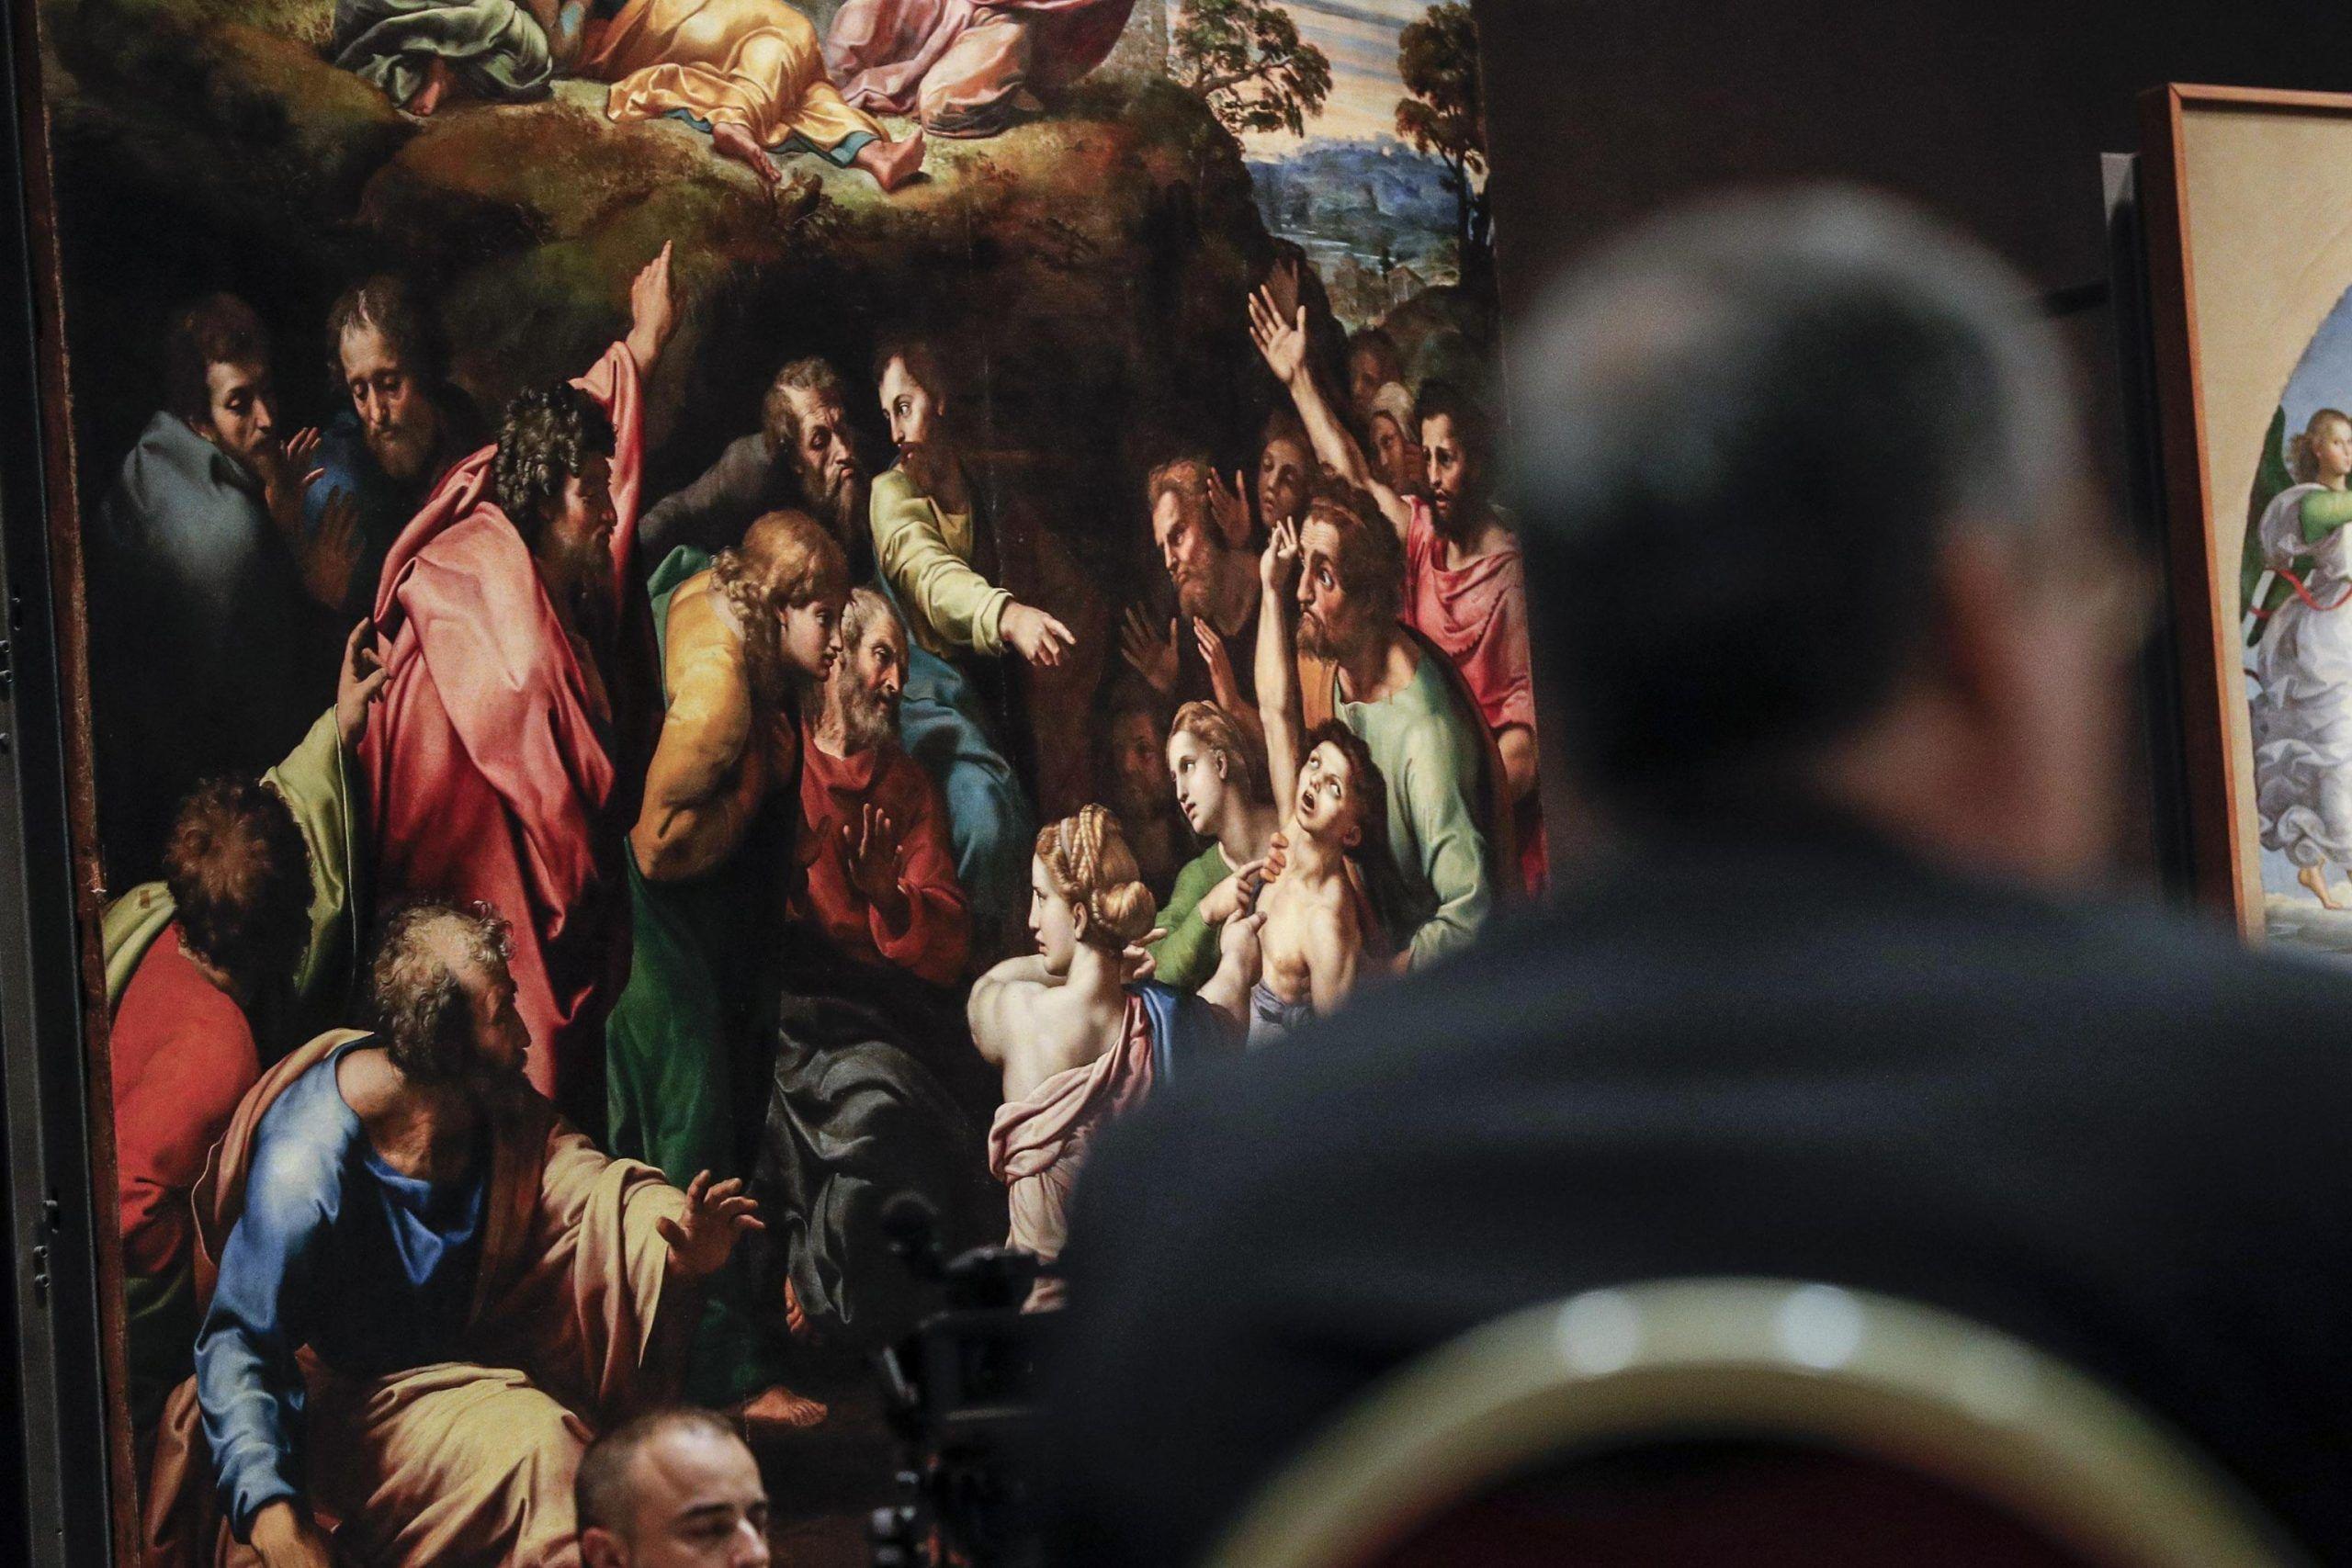 Michelangelo star per live show multimediale